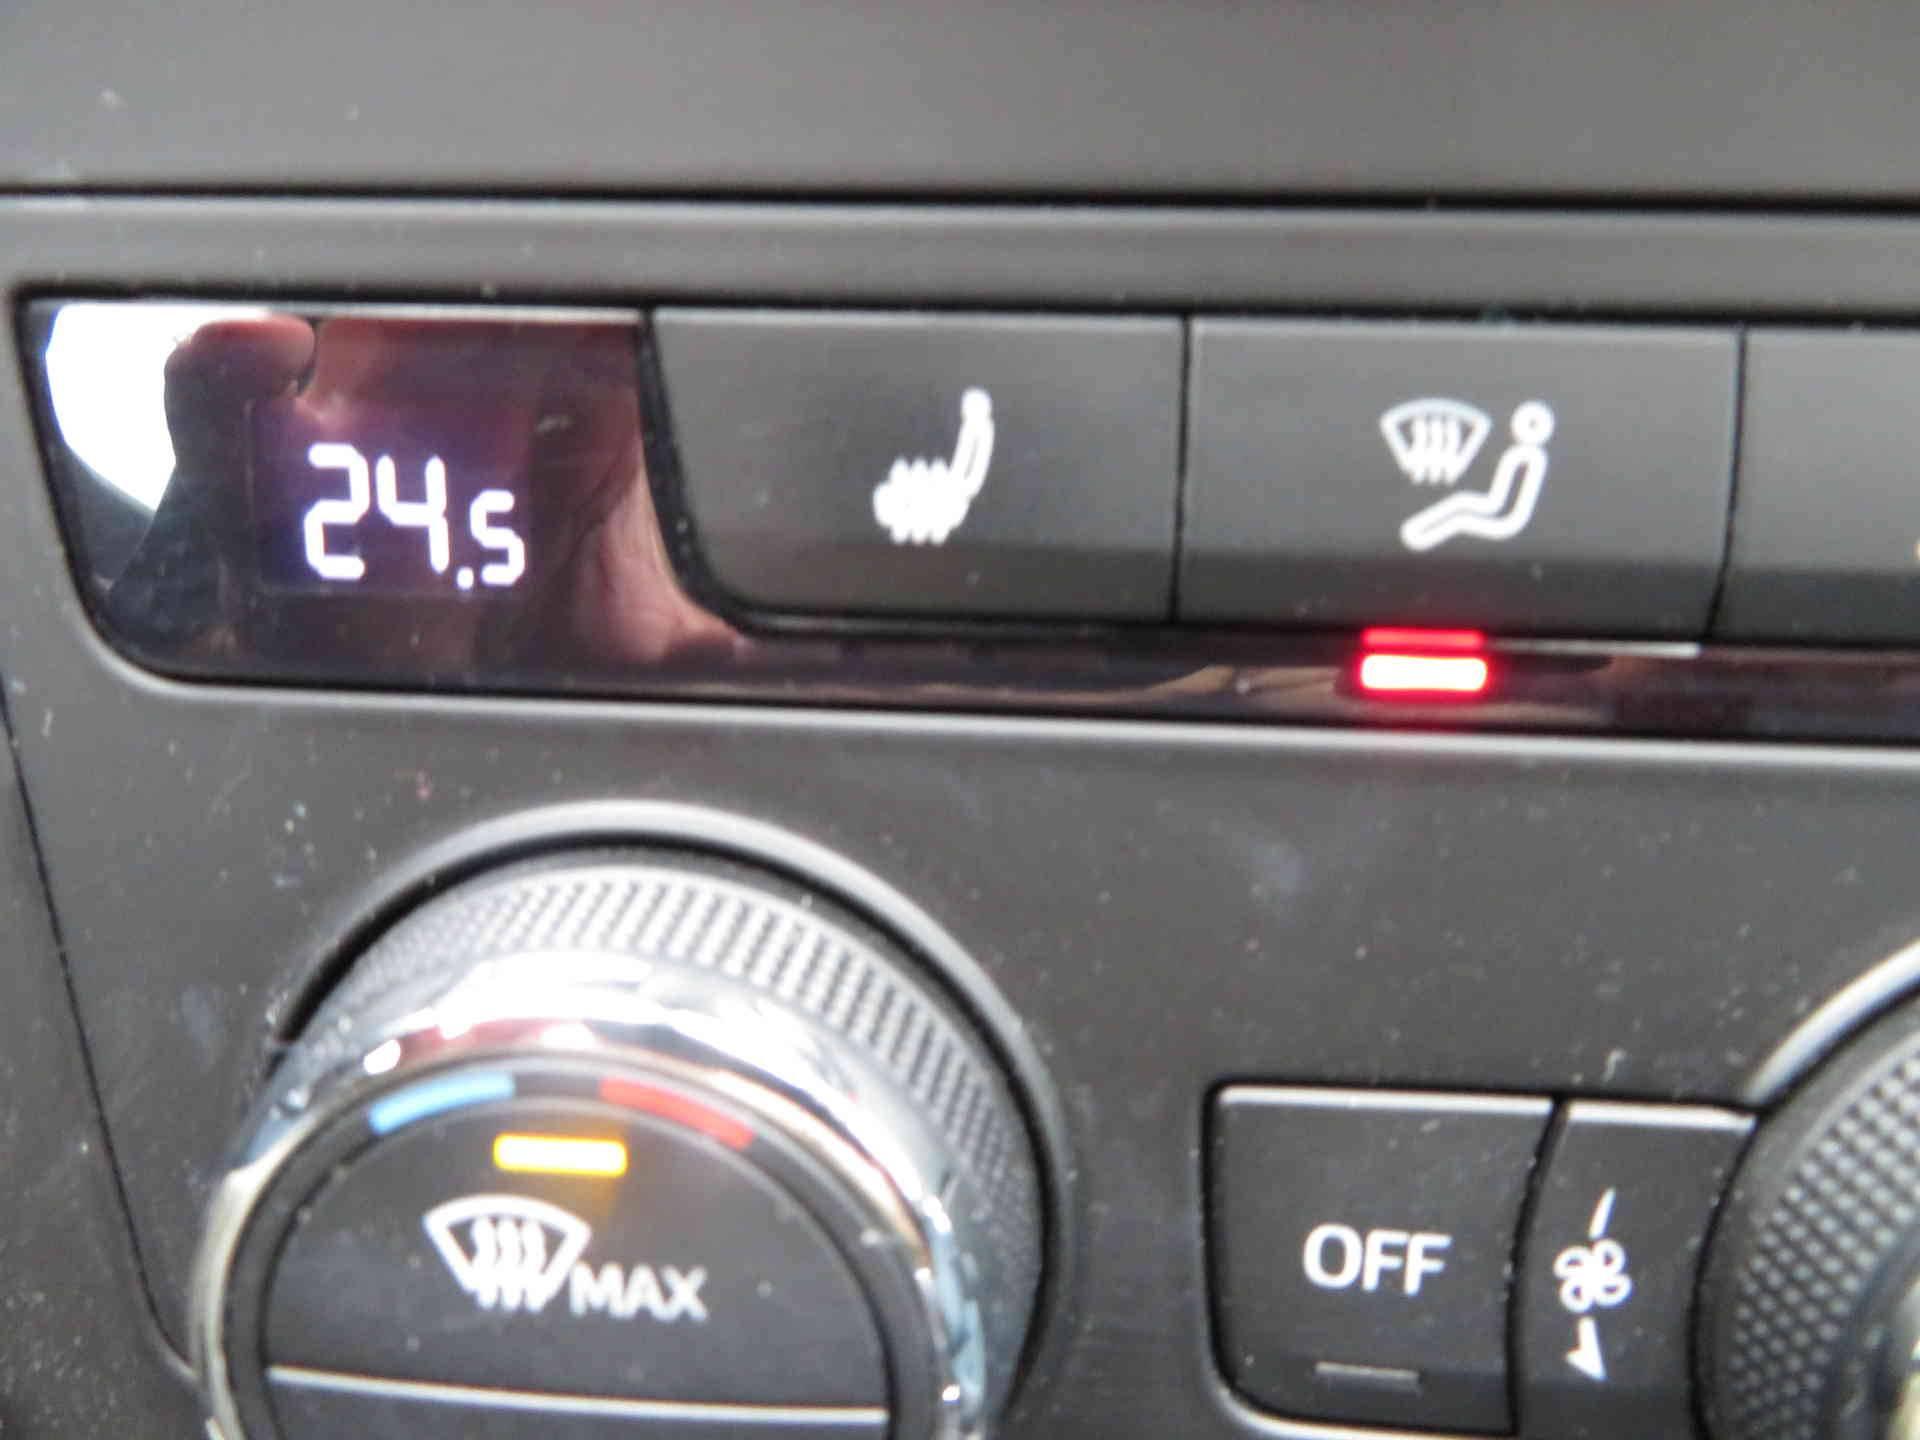 11 - Ateca 1.6 TDI 115 ch Start/Stop Ecomotive